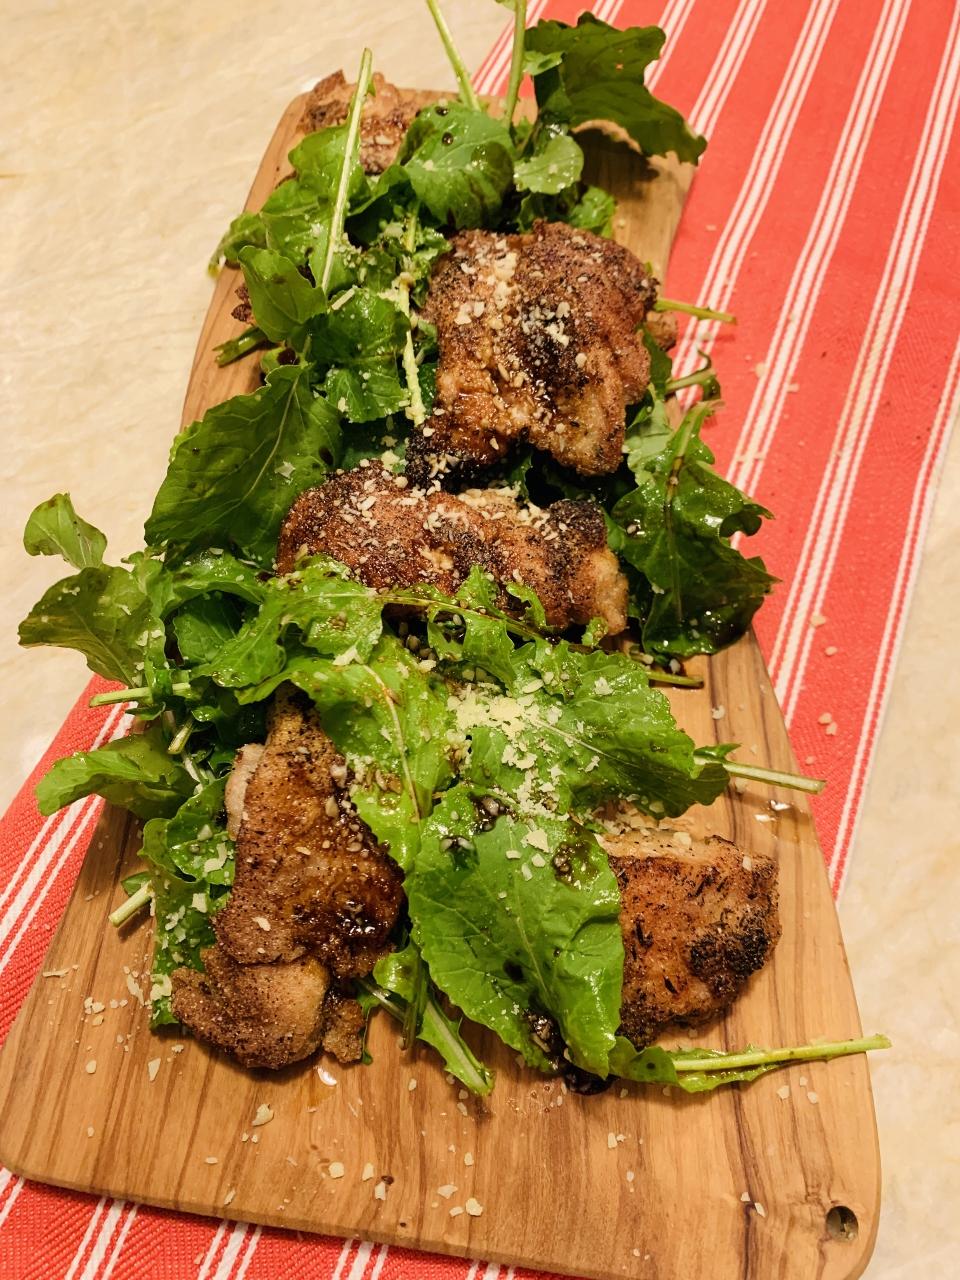 Crispy Chicken, Arugula, Parmesan, Balsamic Image 5